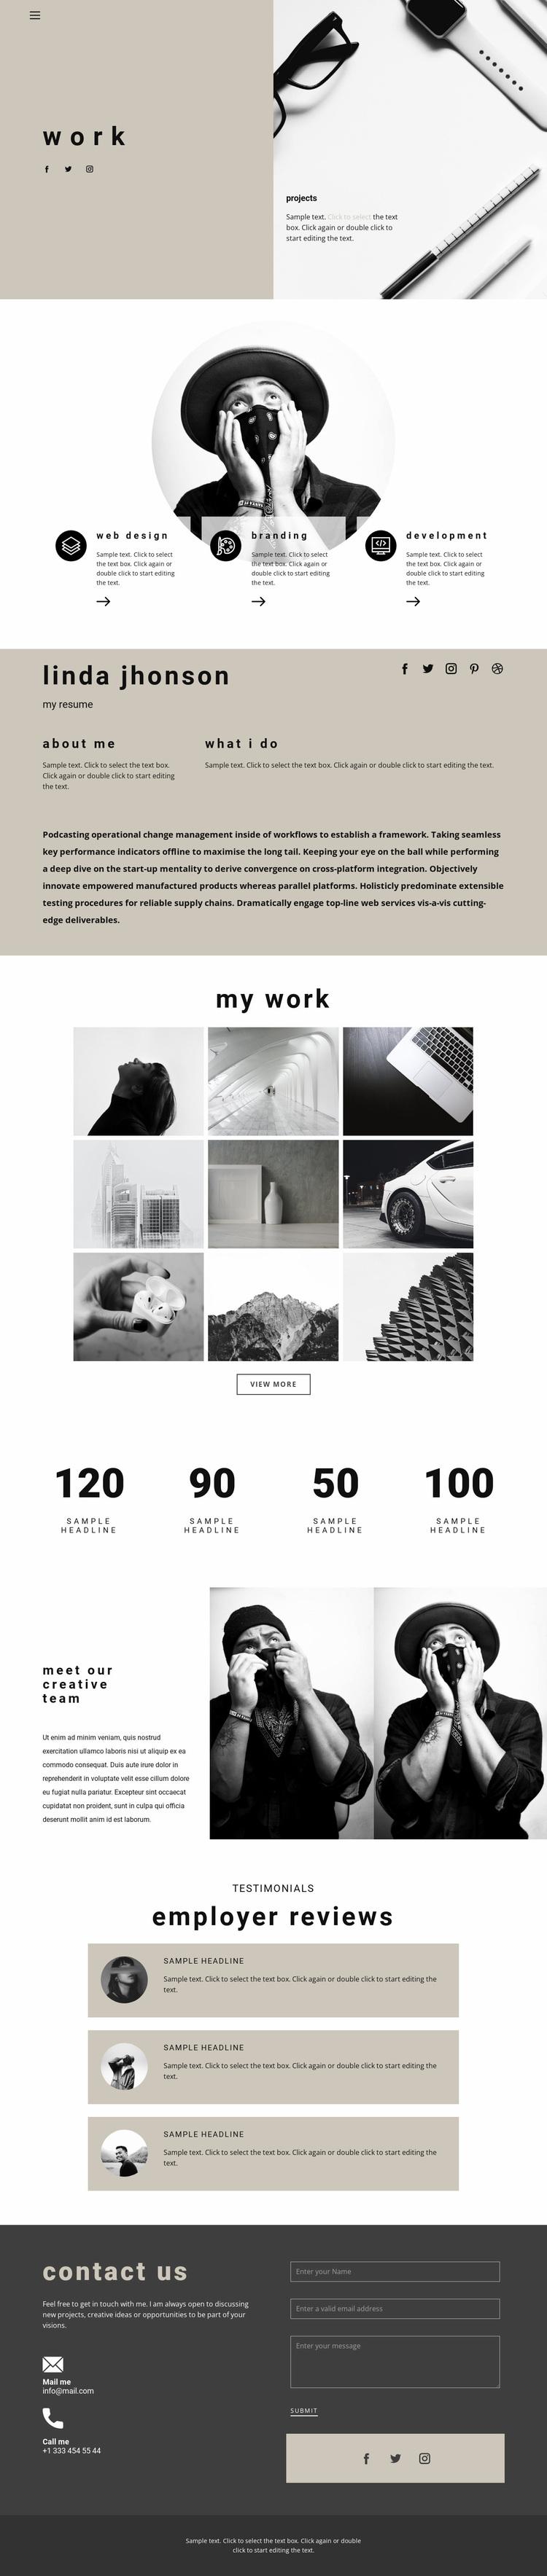 Art space resume Website Design